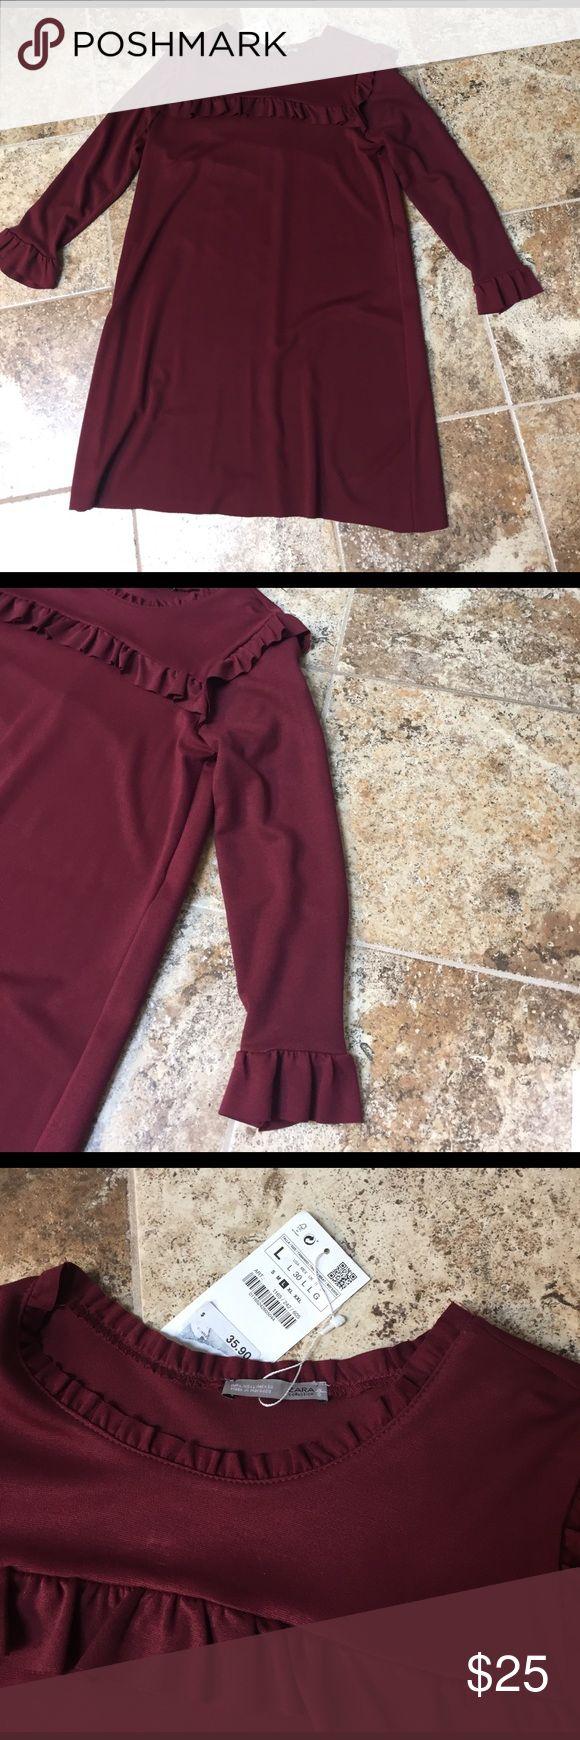 Zara Dress NWT Zara burgundy dress with ruffle detailing around the neck and sleeves. Zara Dresses